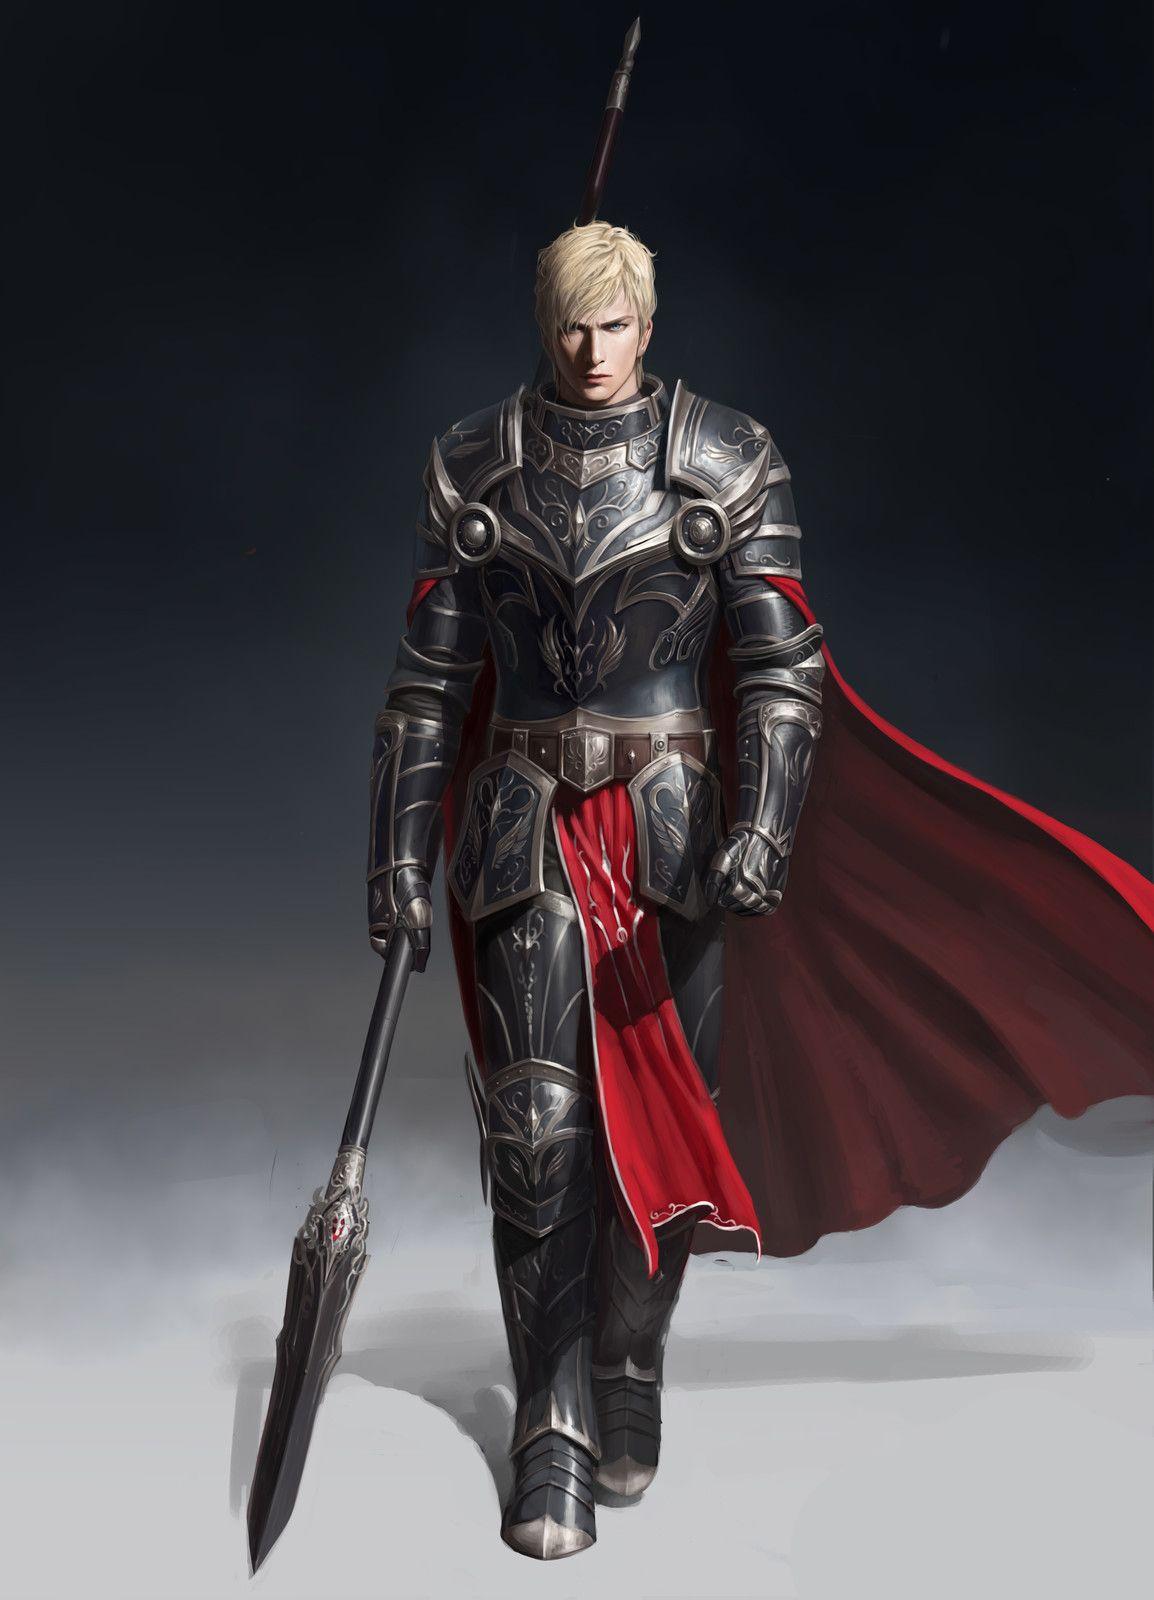 spearman, yongwon park | Fantasy armor, Fantasy character design, Concept art characters